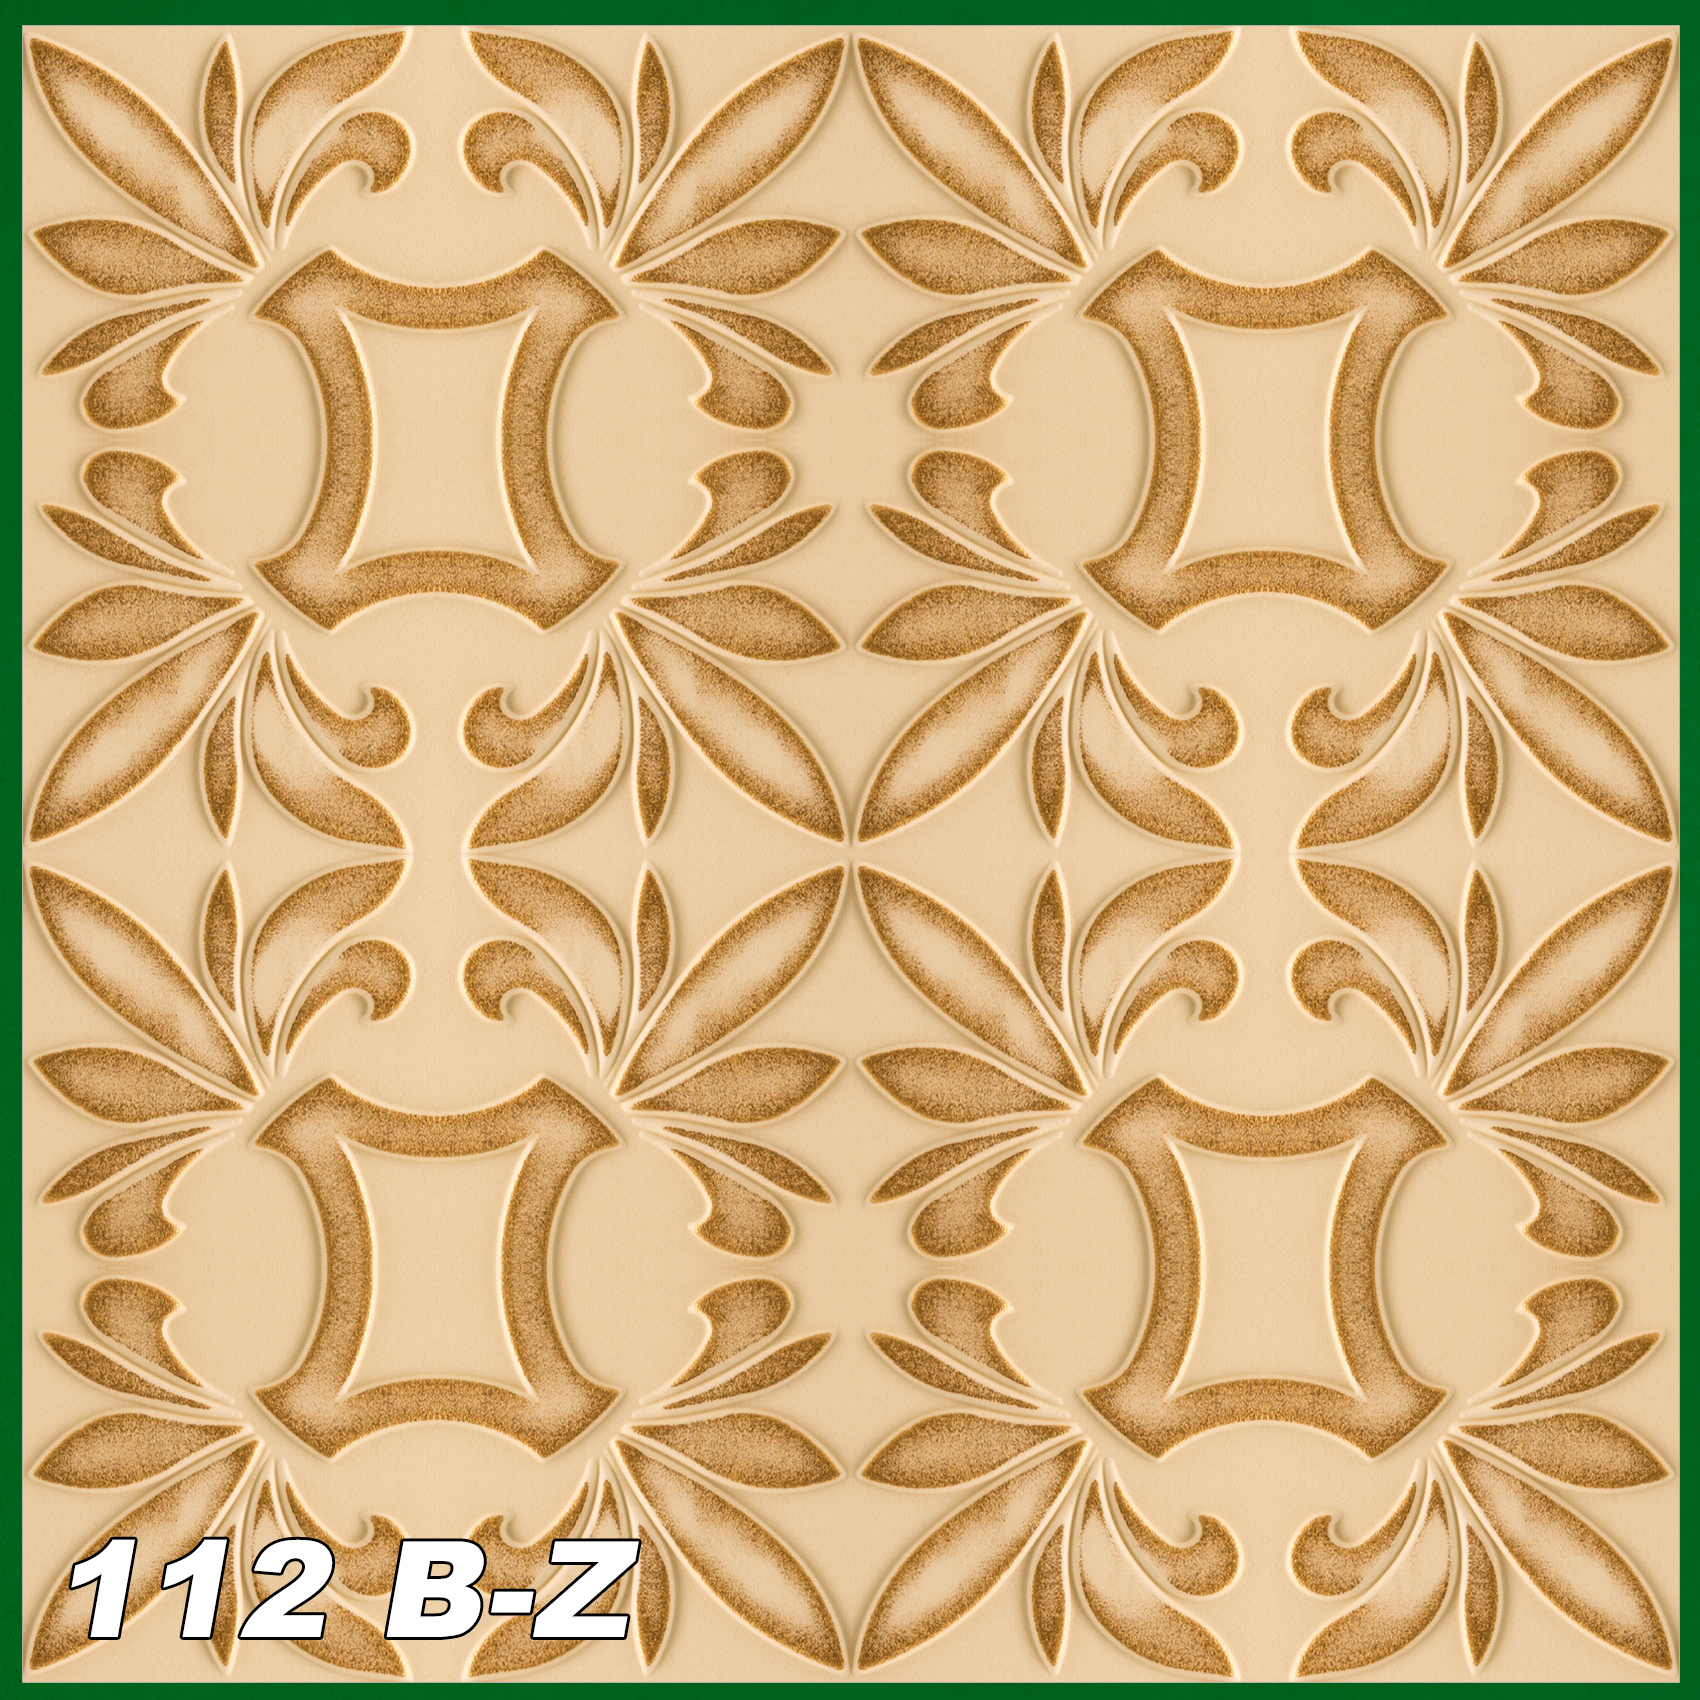 1 saver set ceiling tiles retro ceiling design beige gold 50x50cm 1 bundle of ceiling tiles retro ceiling design beige gold 50x50cm nr 112 b z dailygadgetfo Choice Image